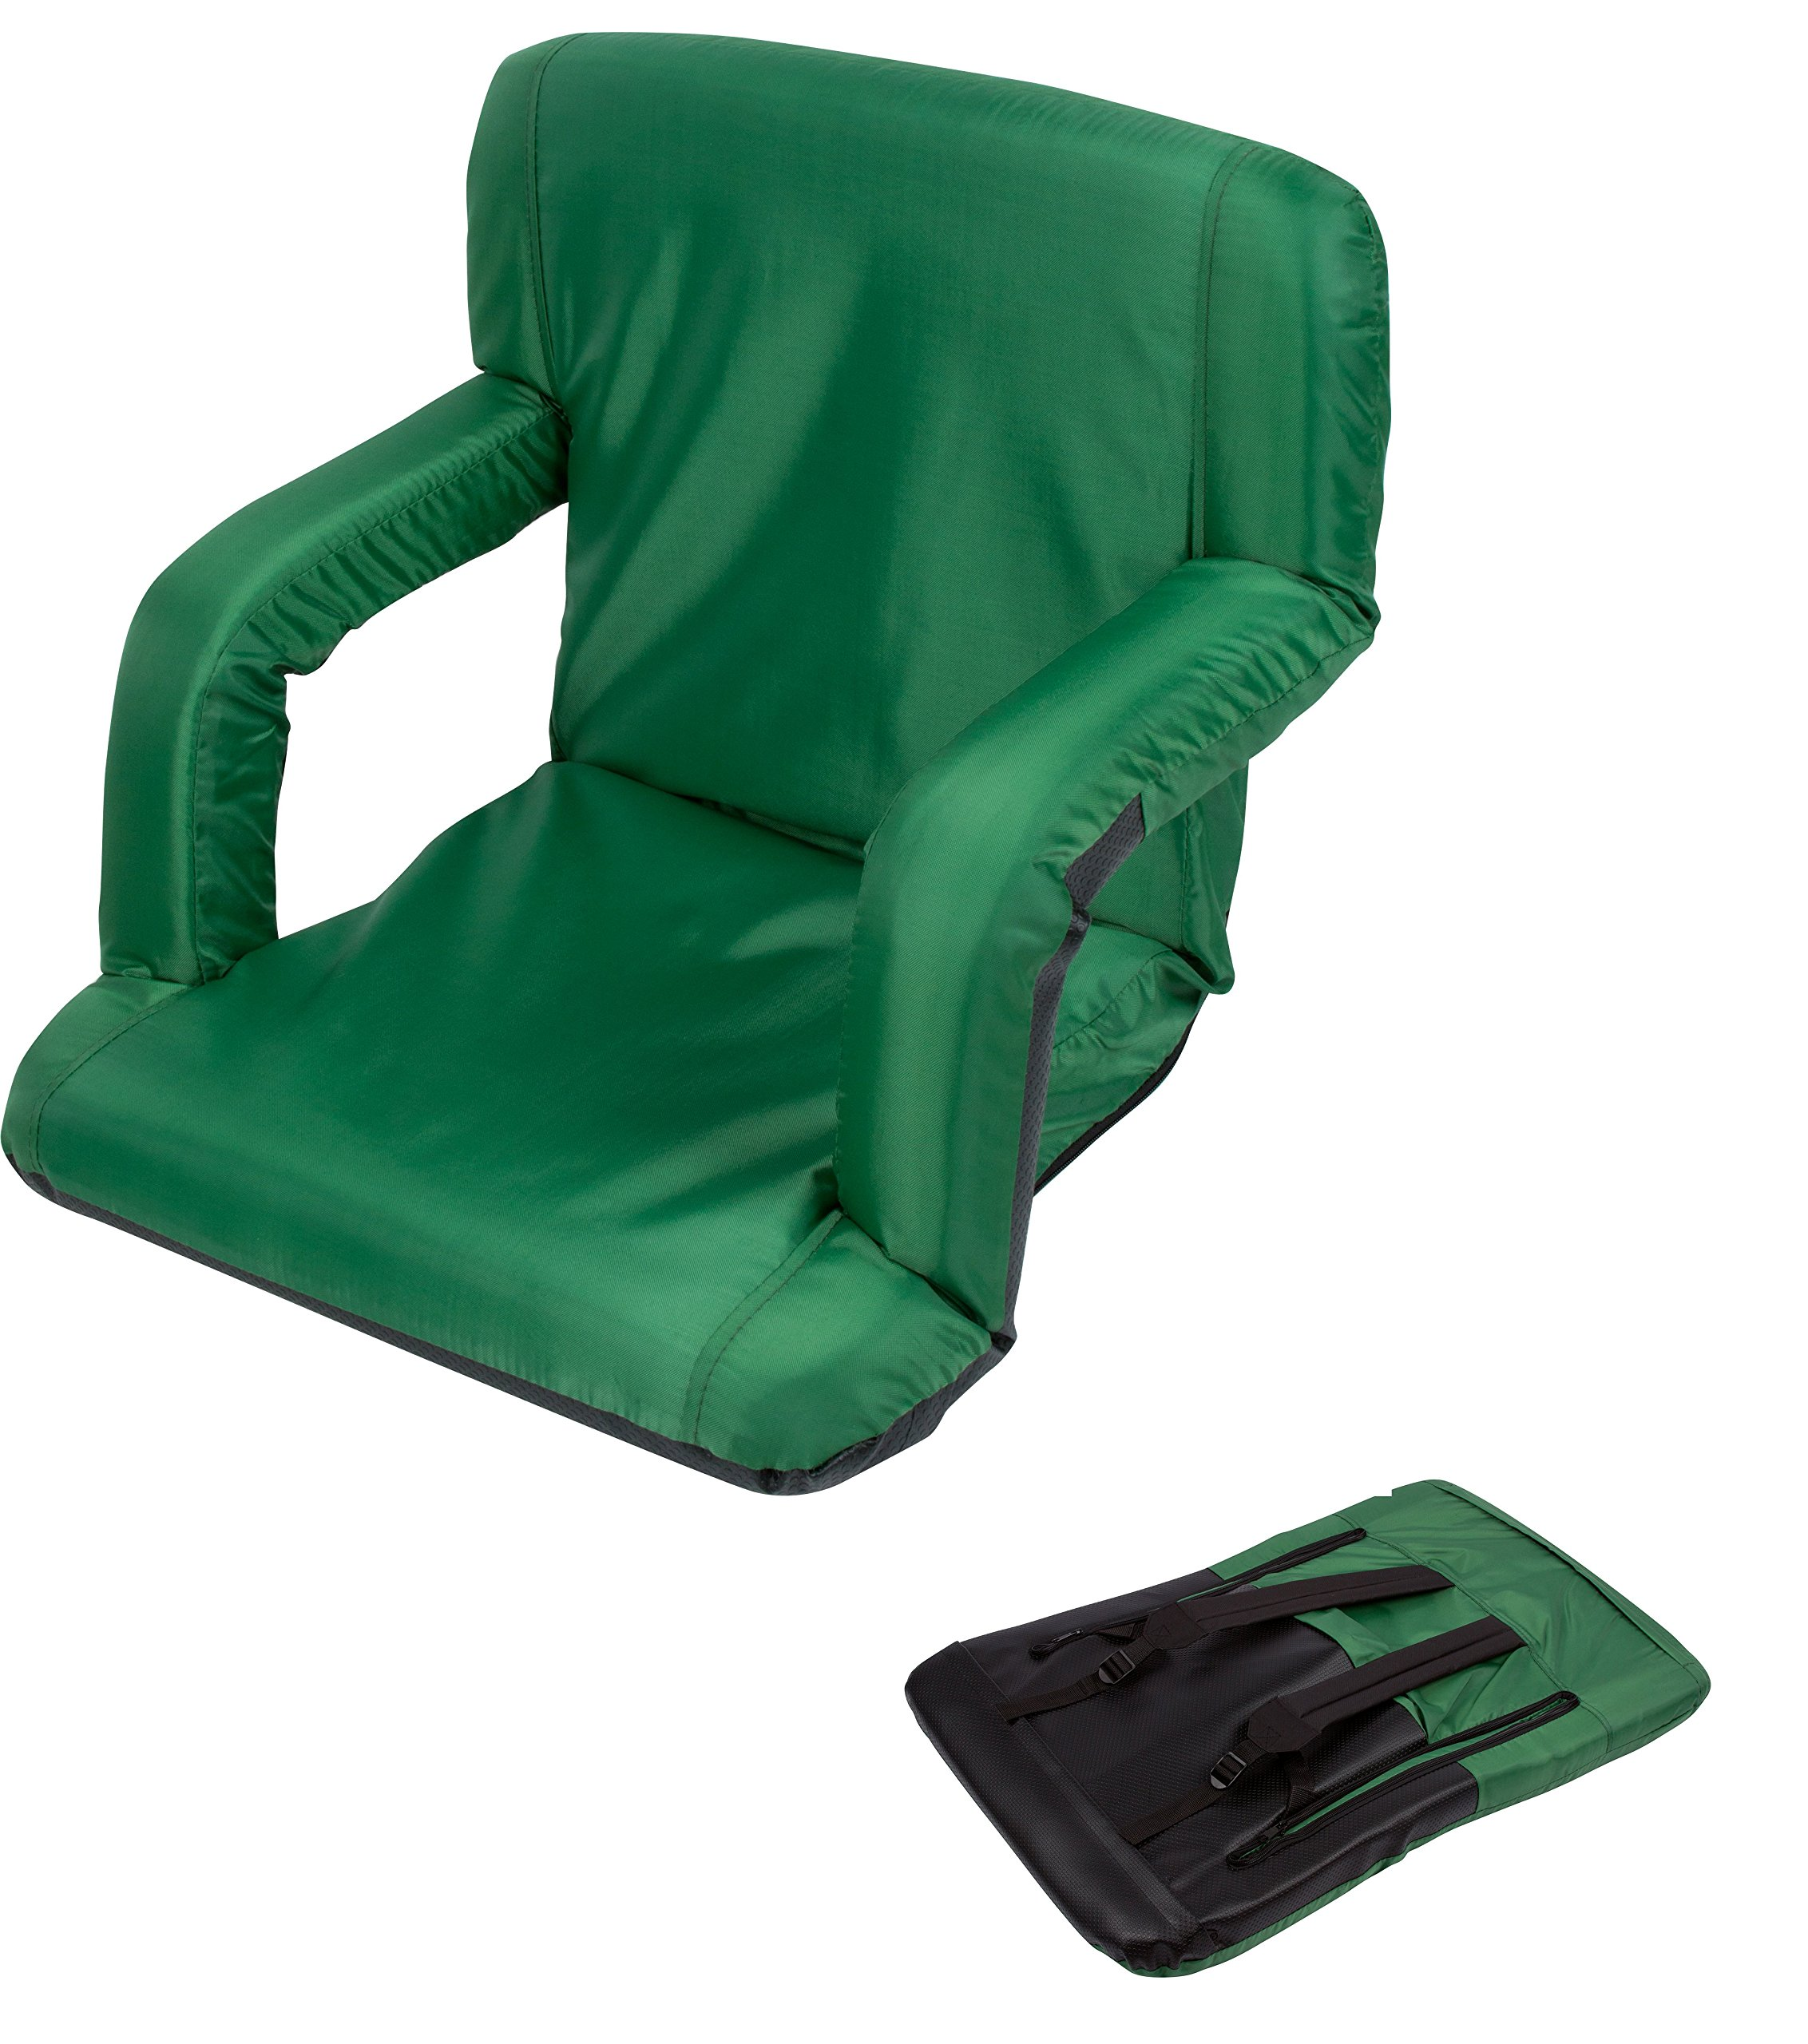 Portable Multiuse Adjustable Recliner Stadium Seat by Trademark Innovations (Green)